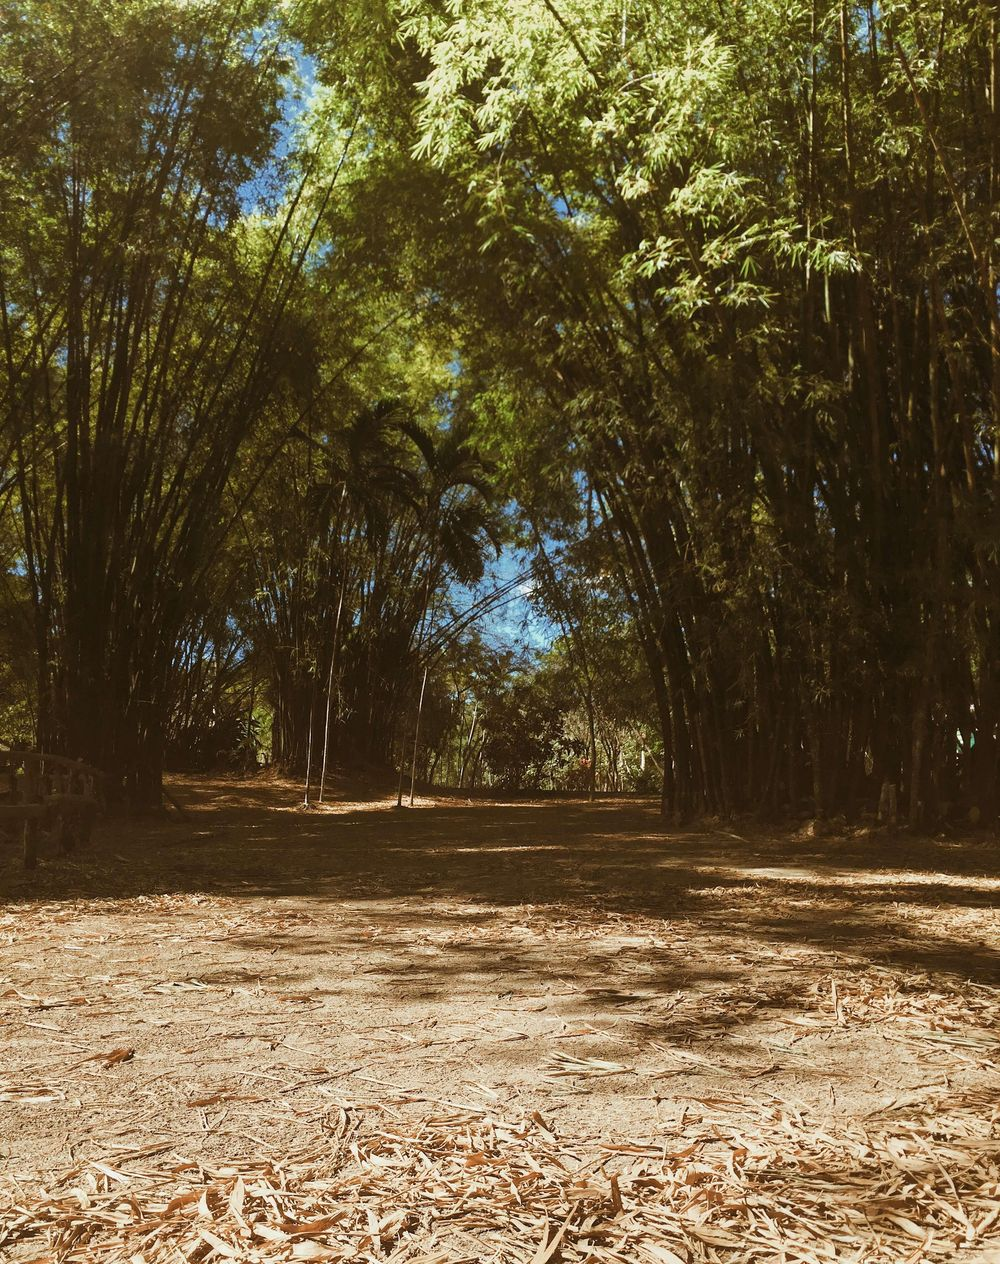 National Botanical Garden - image 1 - student project